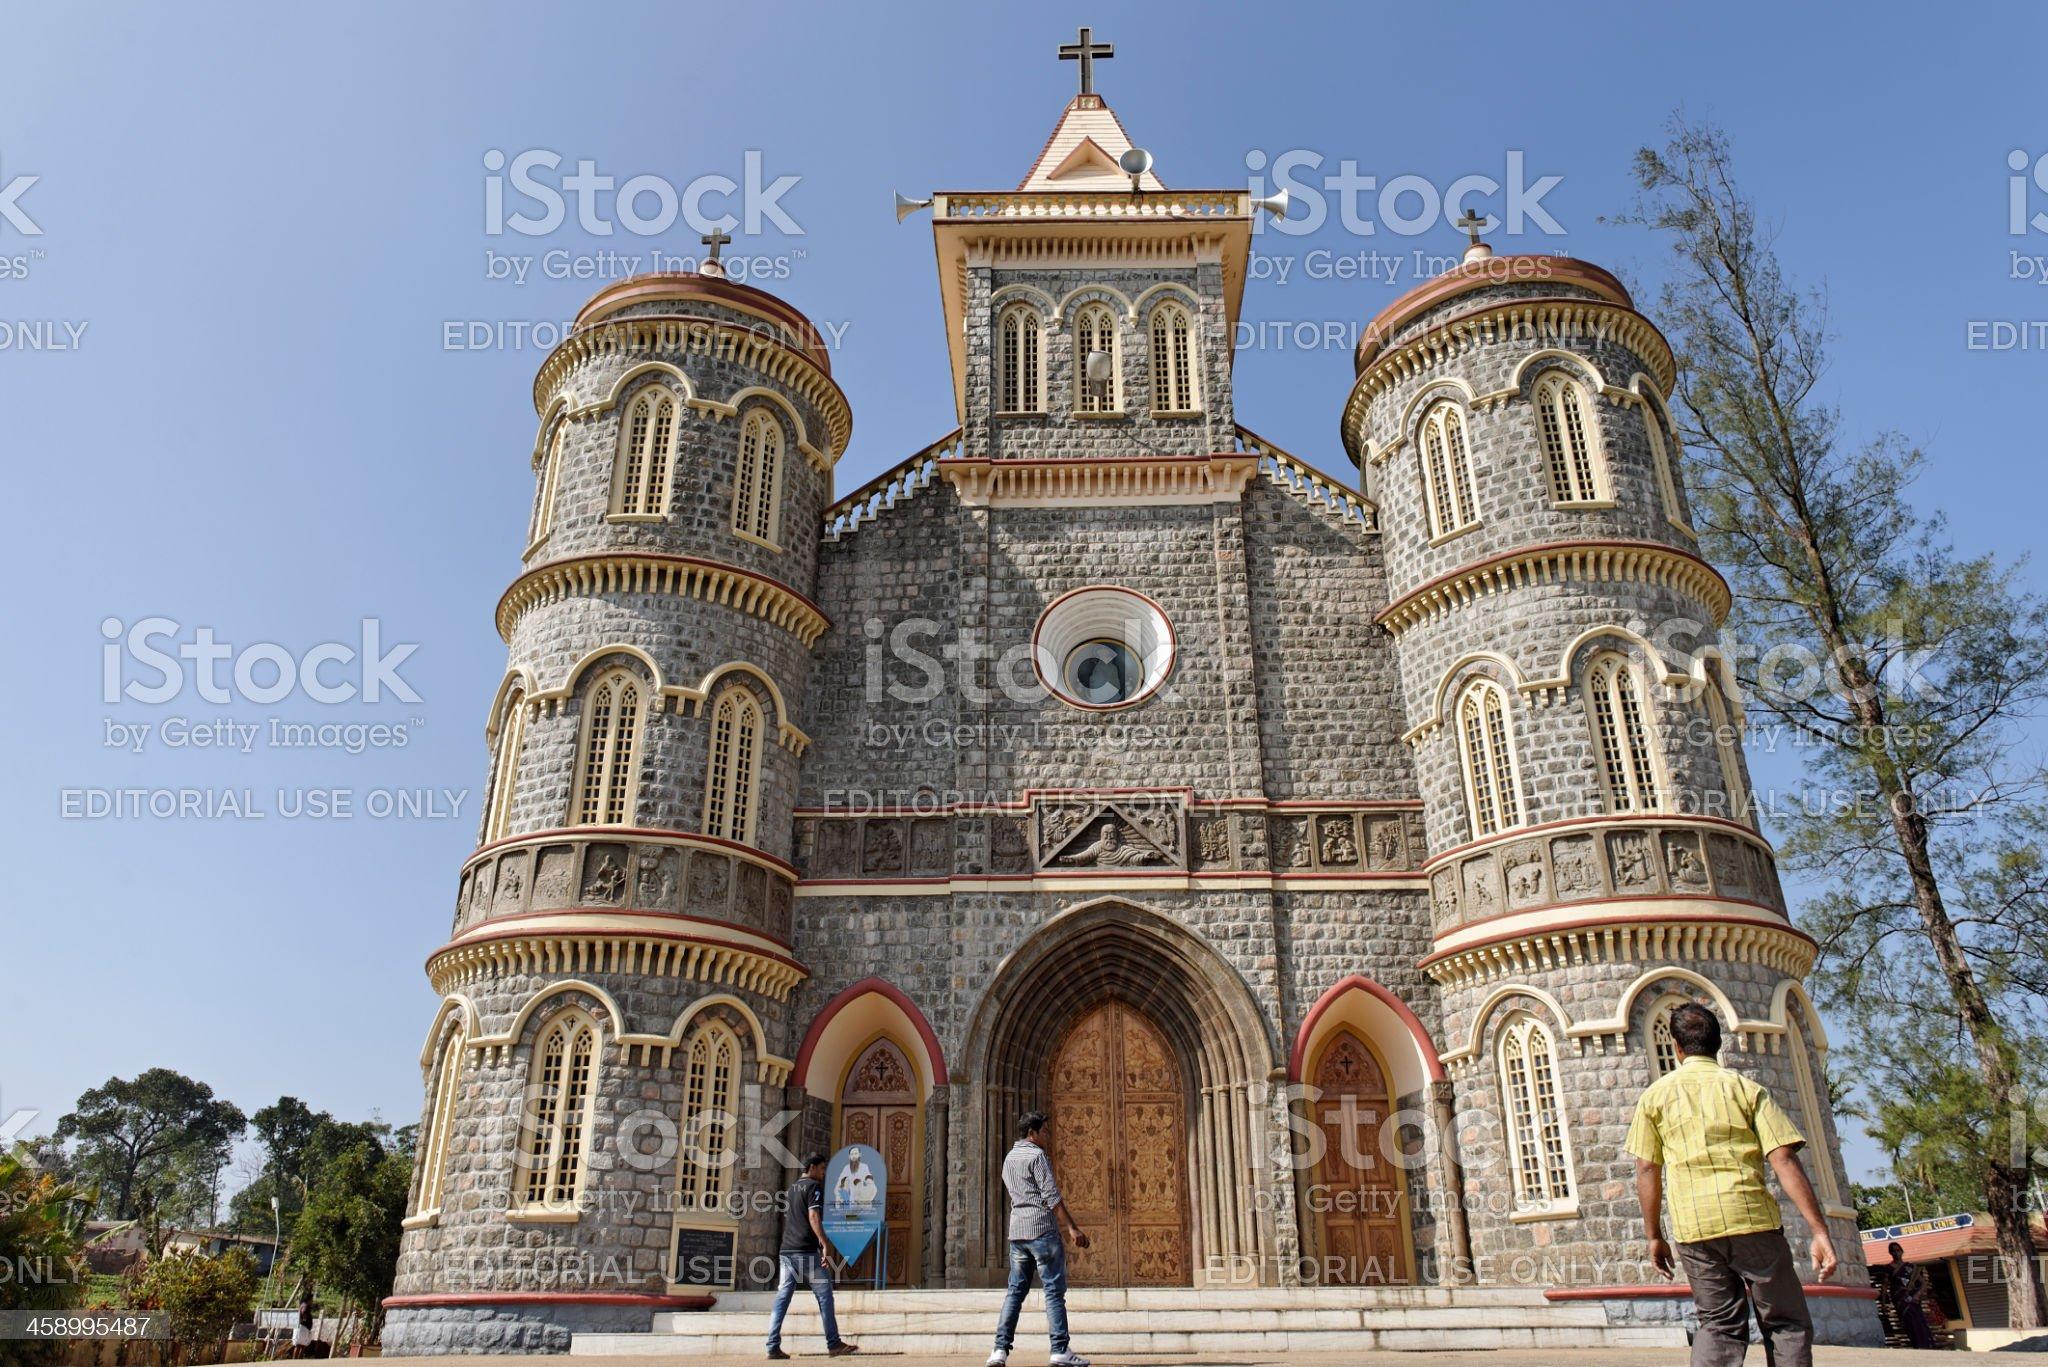 Igreja Católica em Kerala, Índia foto de stock royalty-free